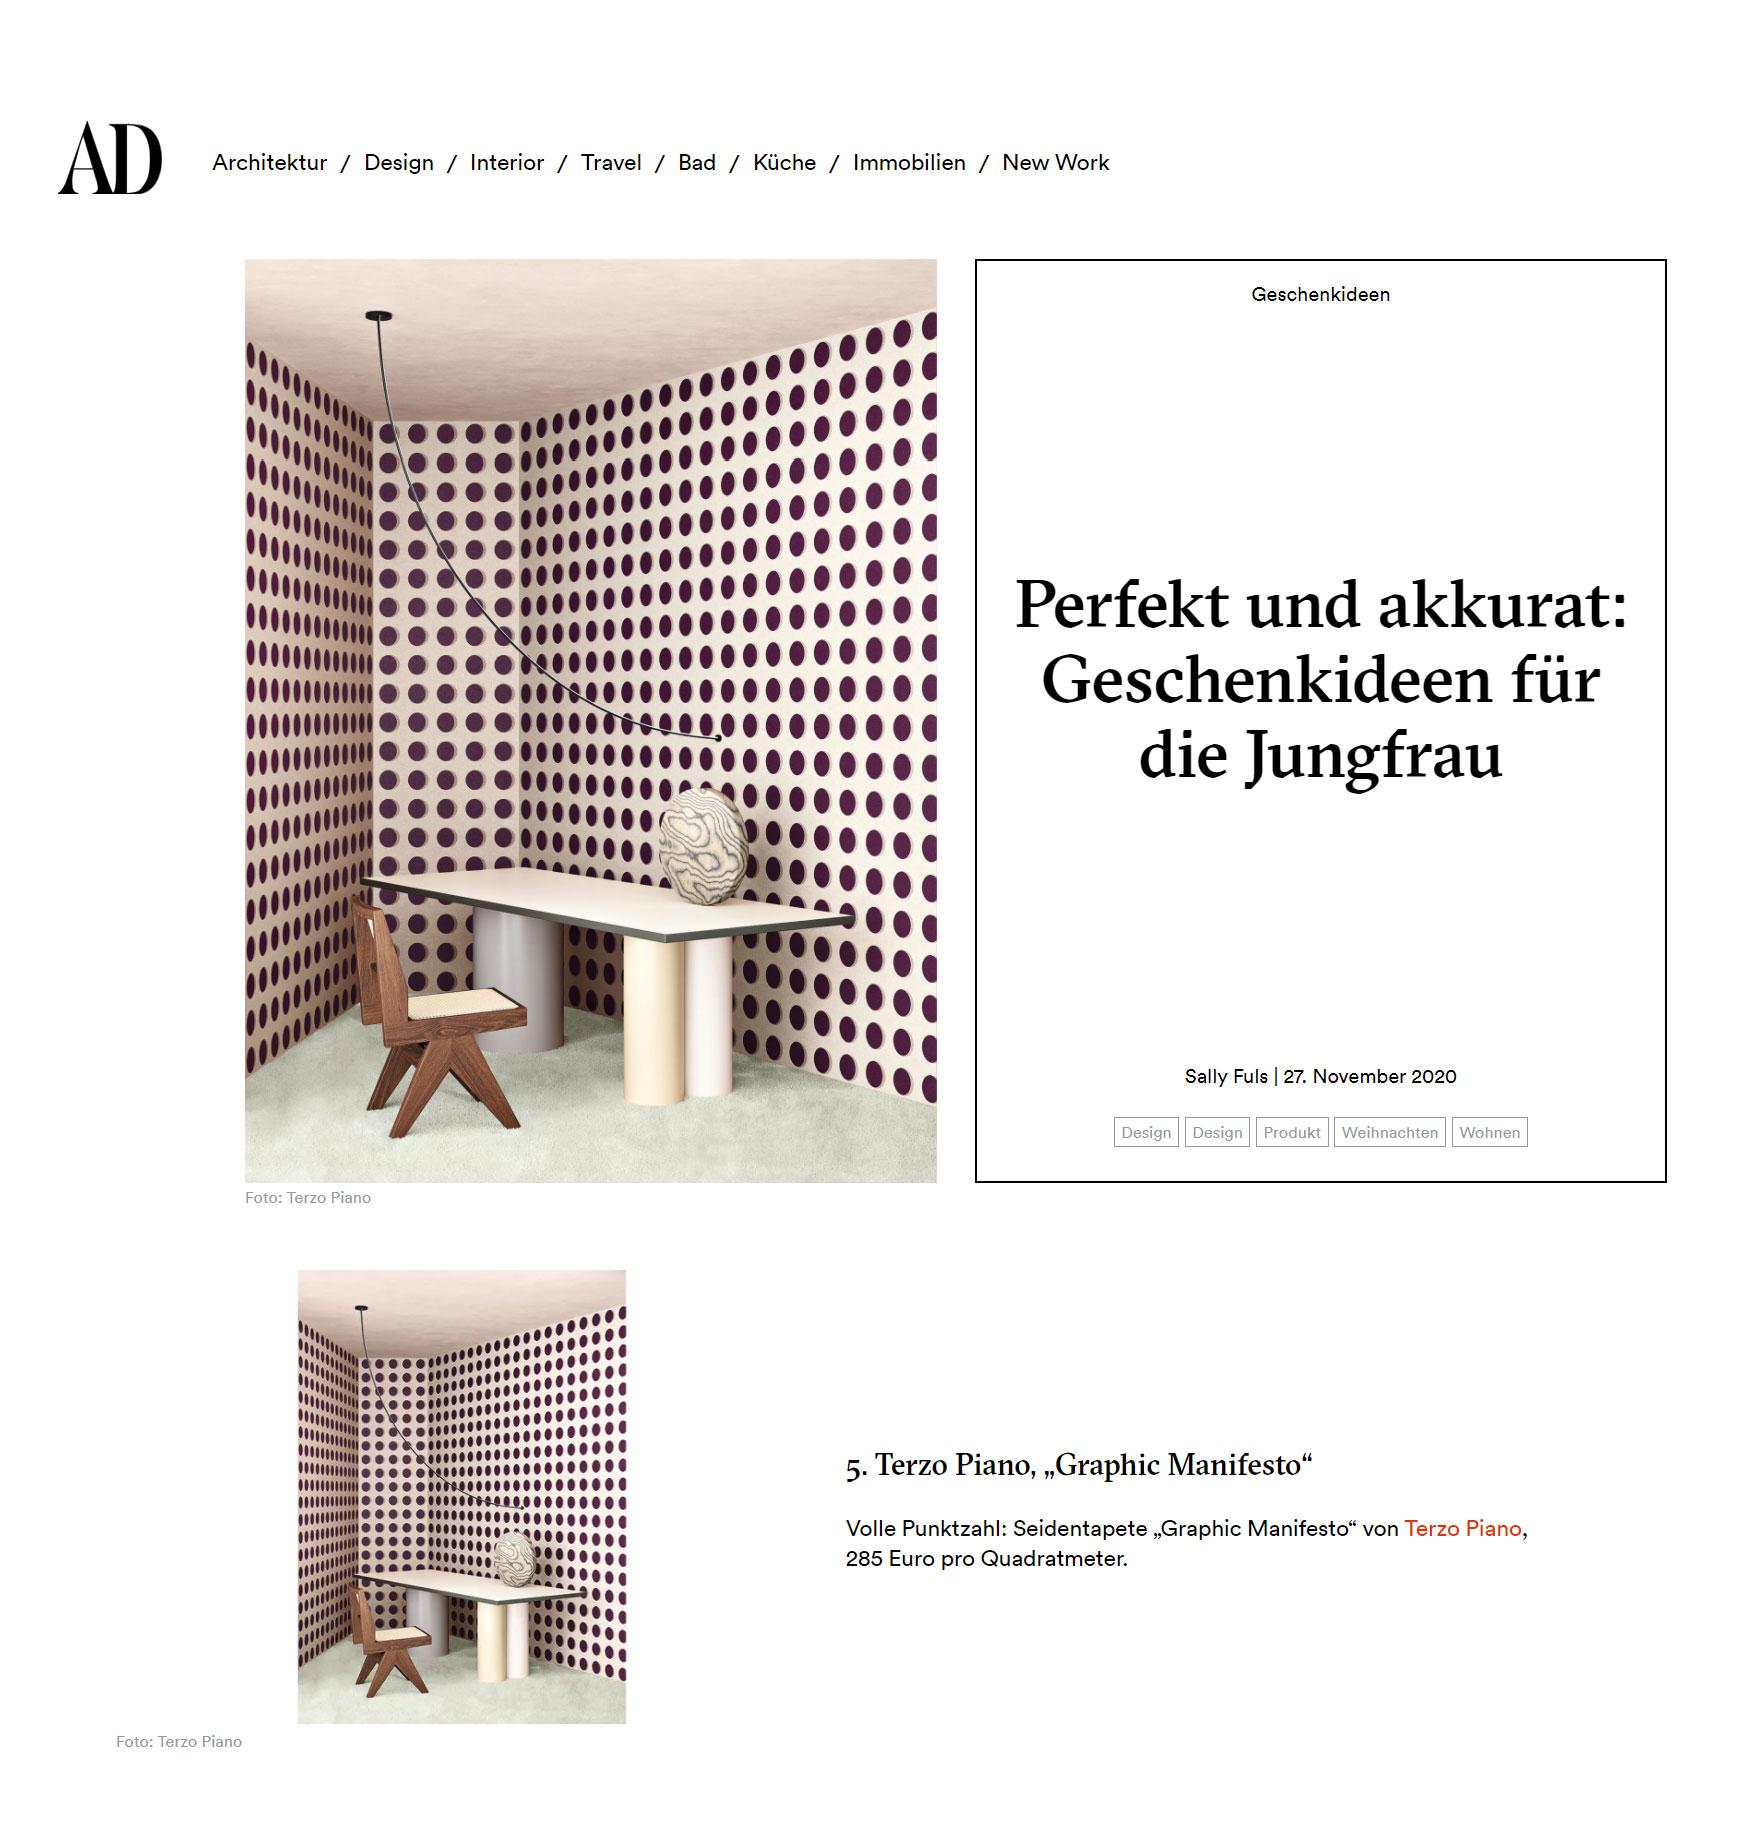 ad-germany--graphic-manifesto